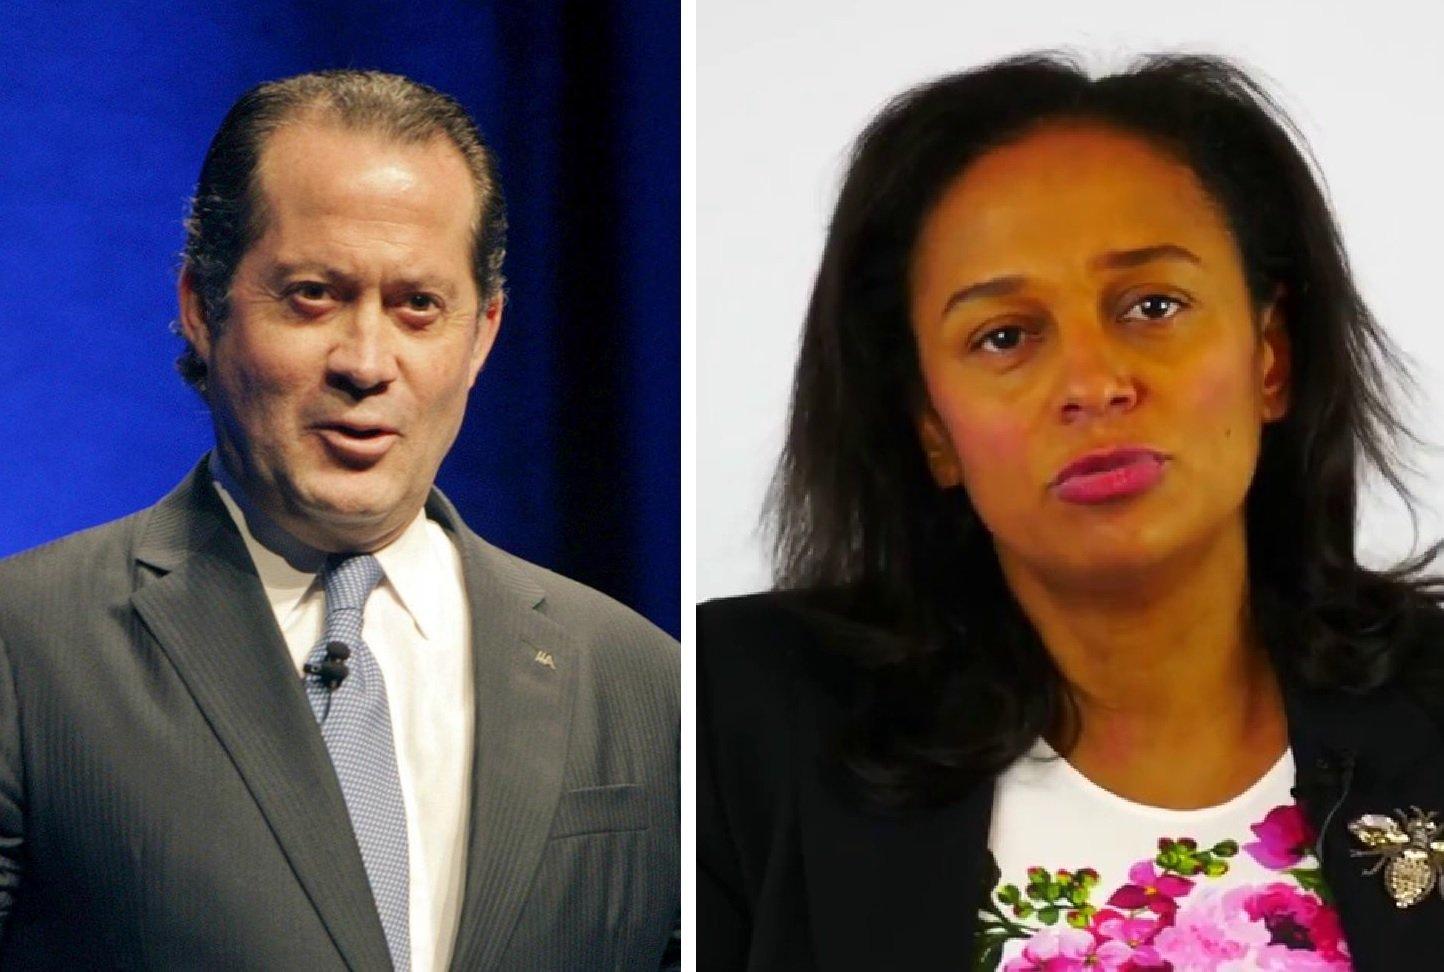 Juan Carlos Escotet e Isabel dos Santos